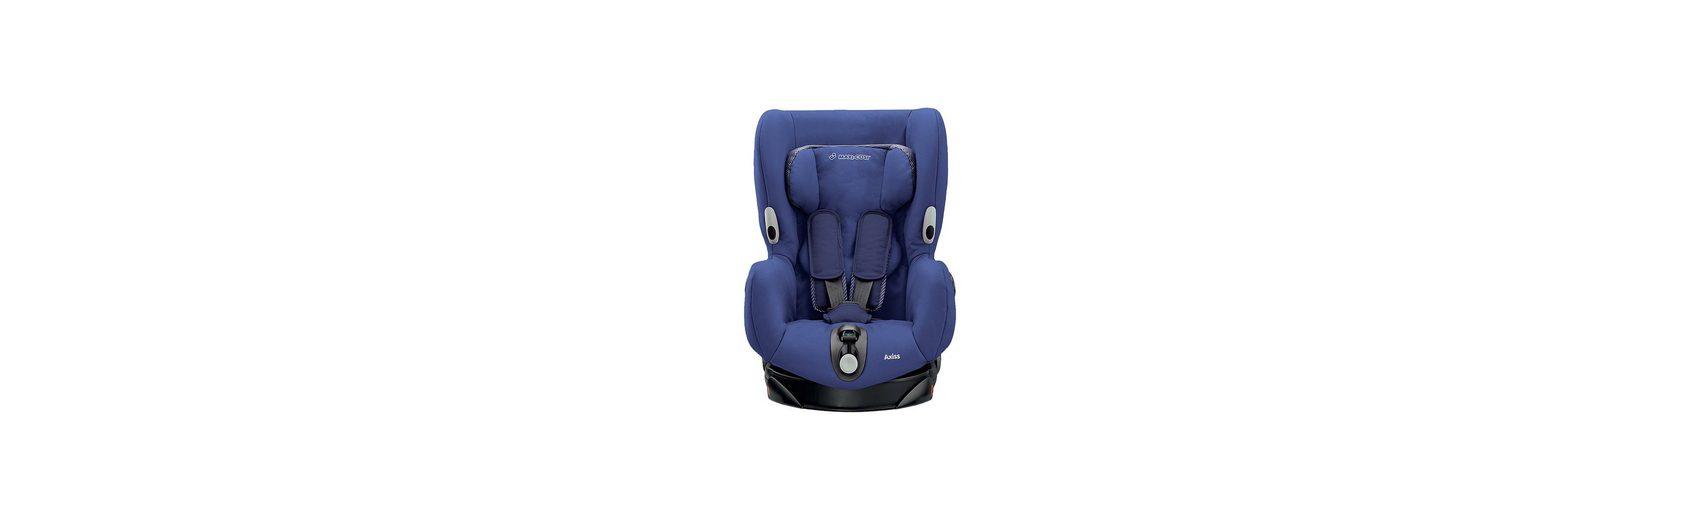 Maxi-Cosi Auto-Kindersitz Axiss, River Blue, 2017